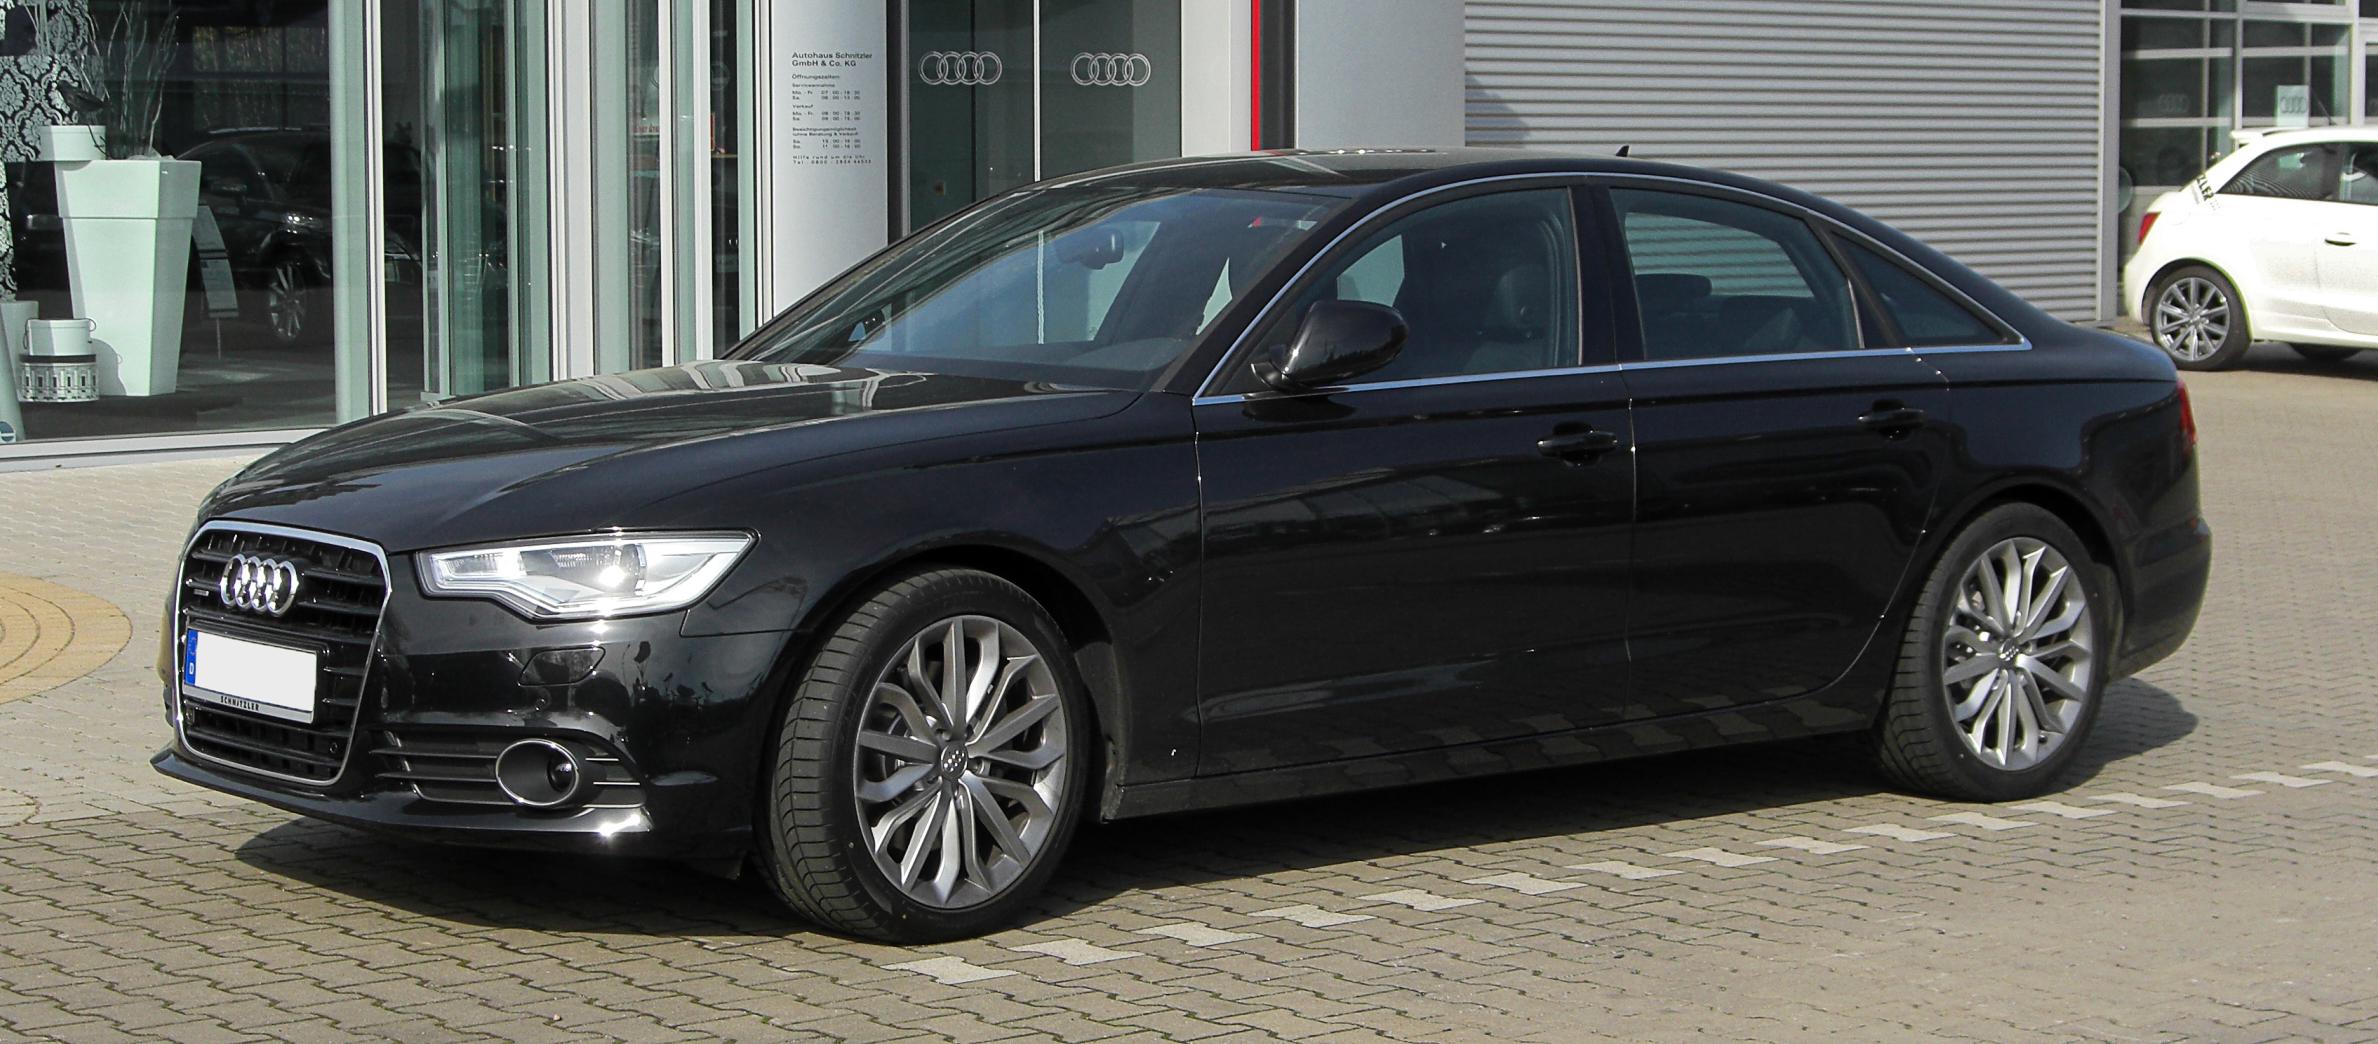 Audi A6 TDI 2O Tip